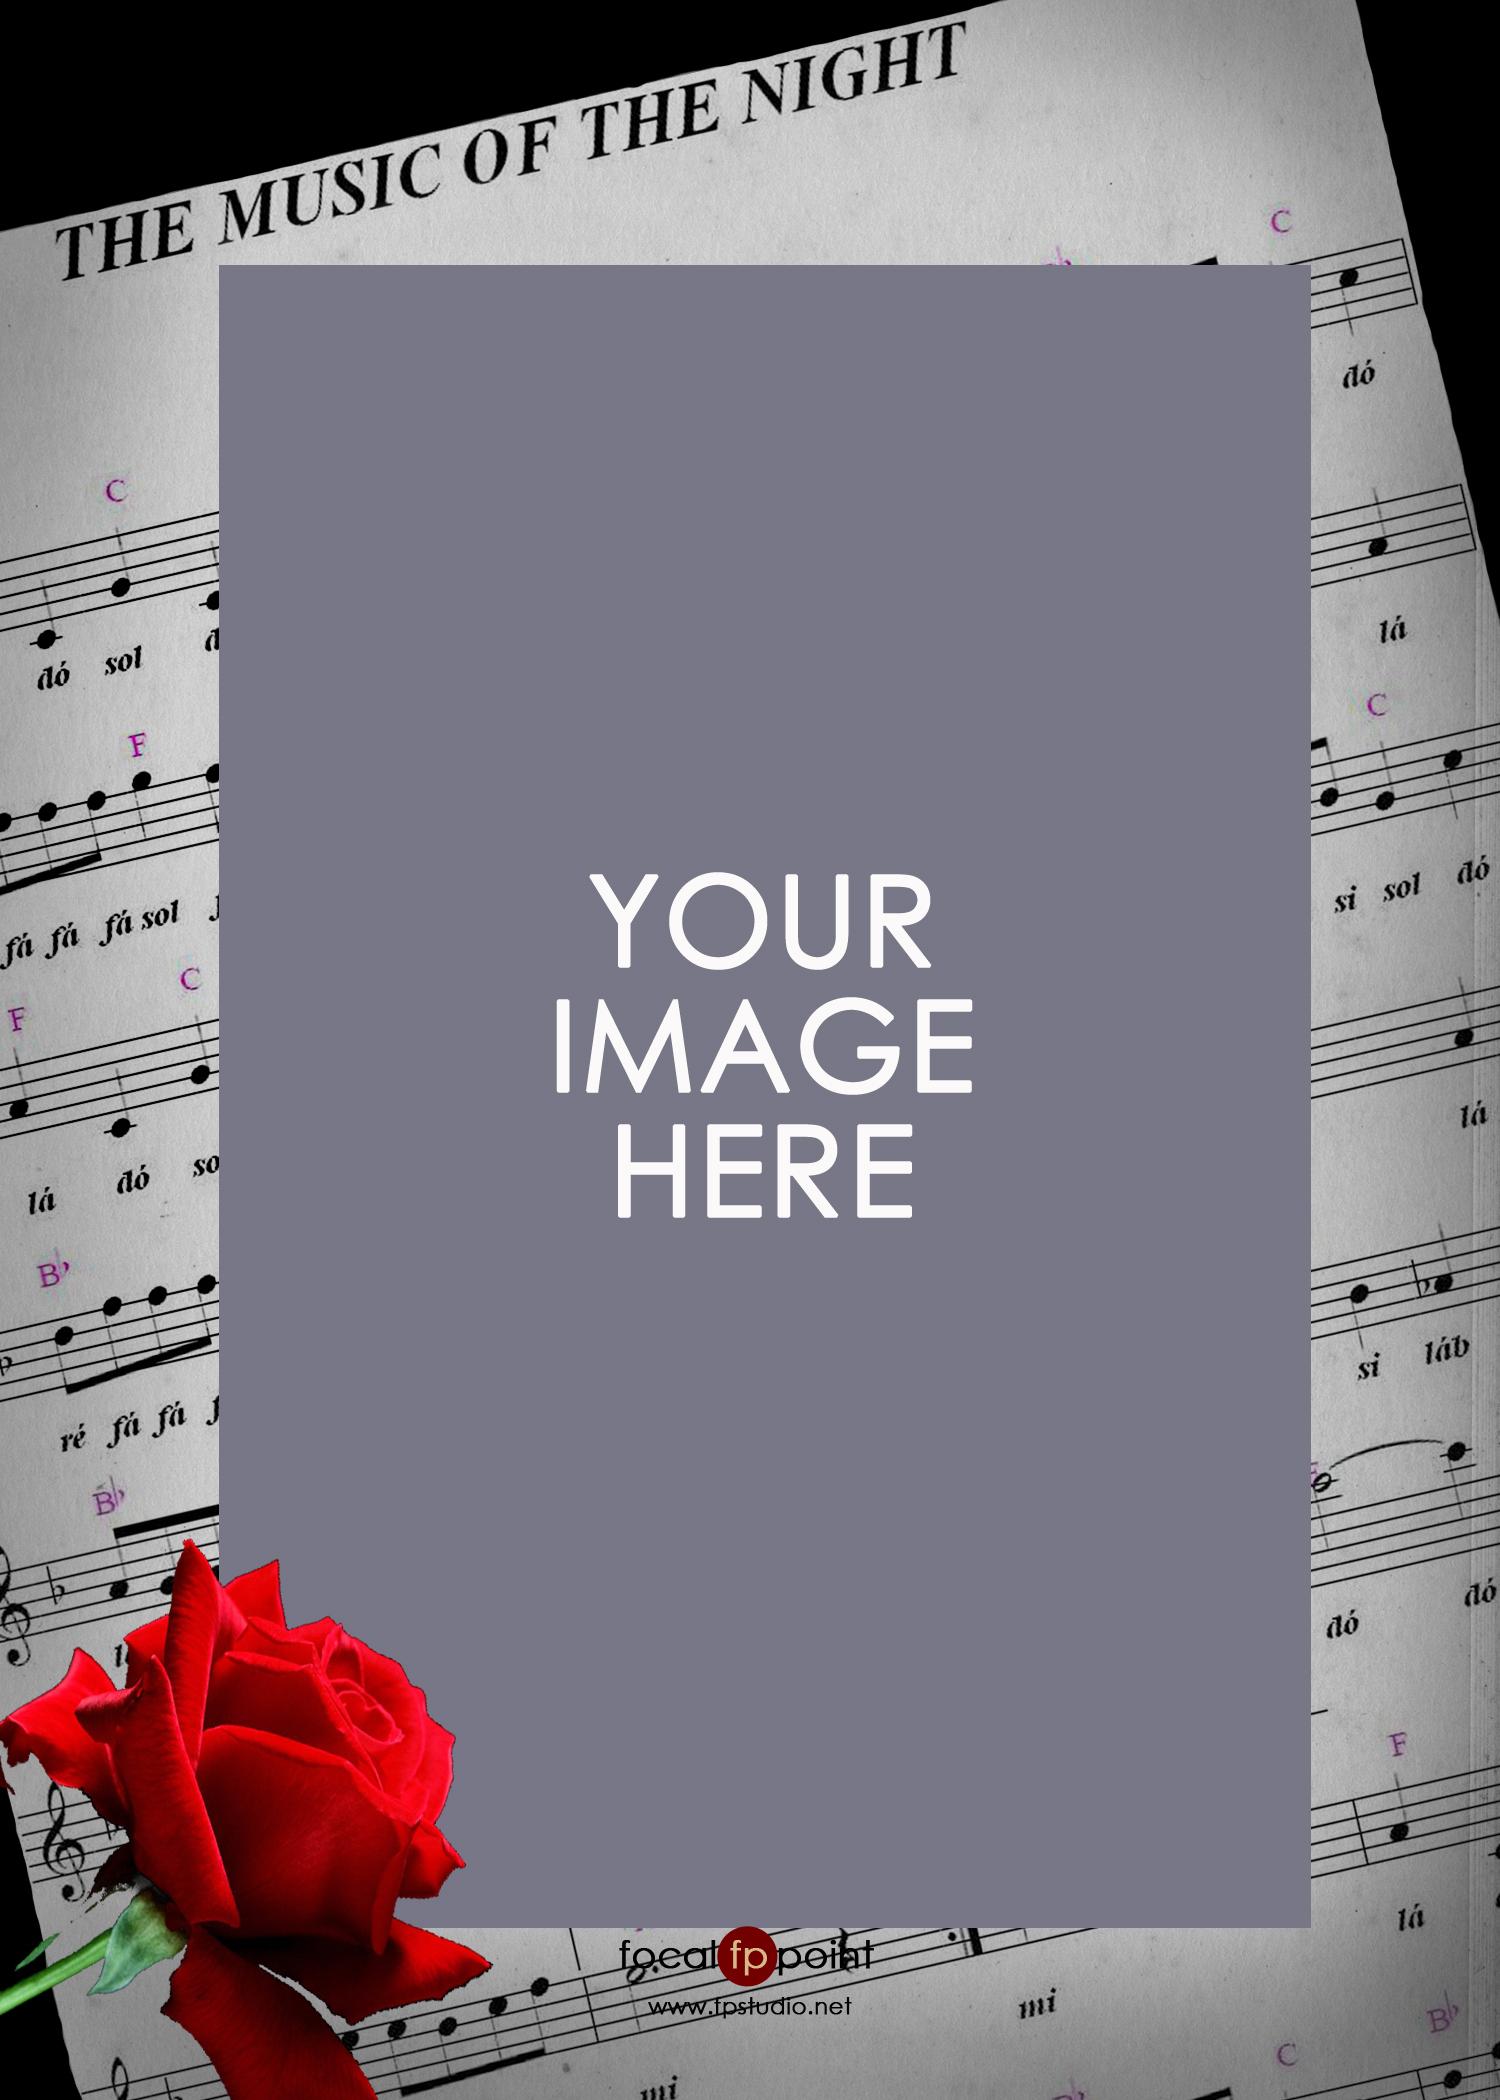 border_music_1_V copy.jpg